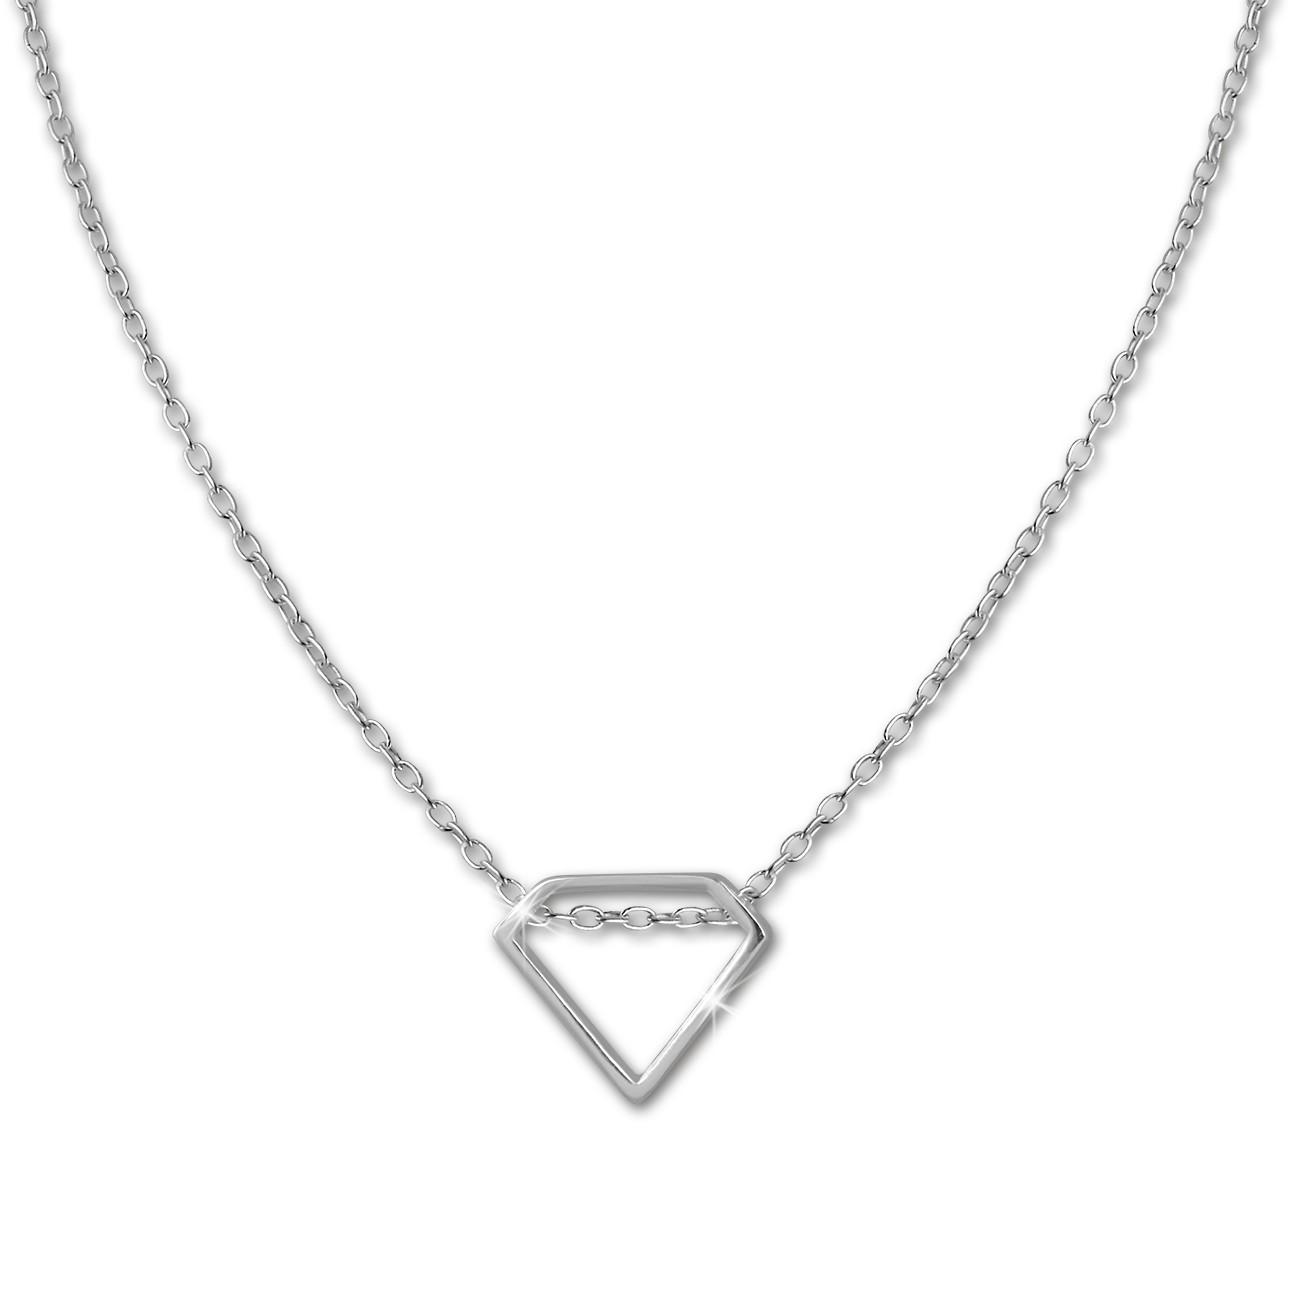 SilberDream Kette Diamant-Form 925er Sterling Silber 46cm Halskette SDK8011J